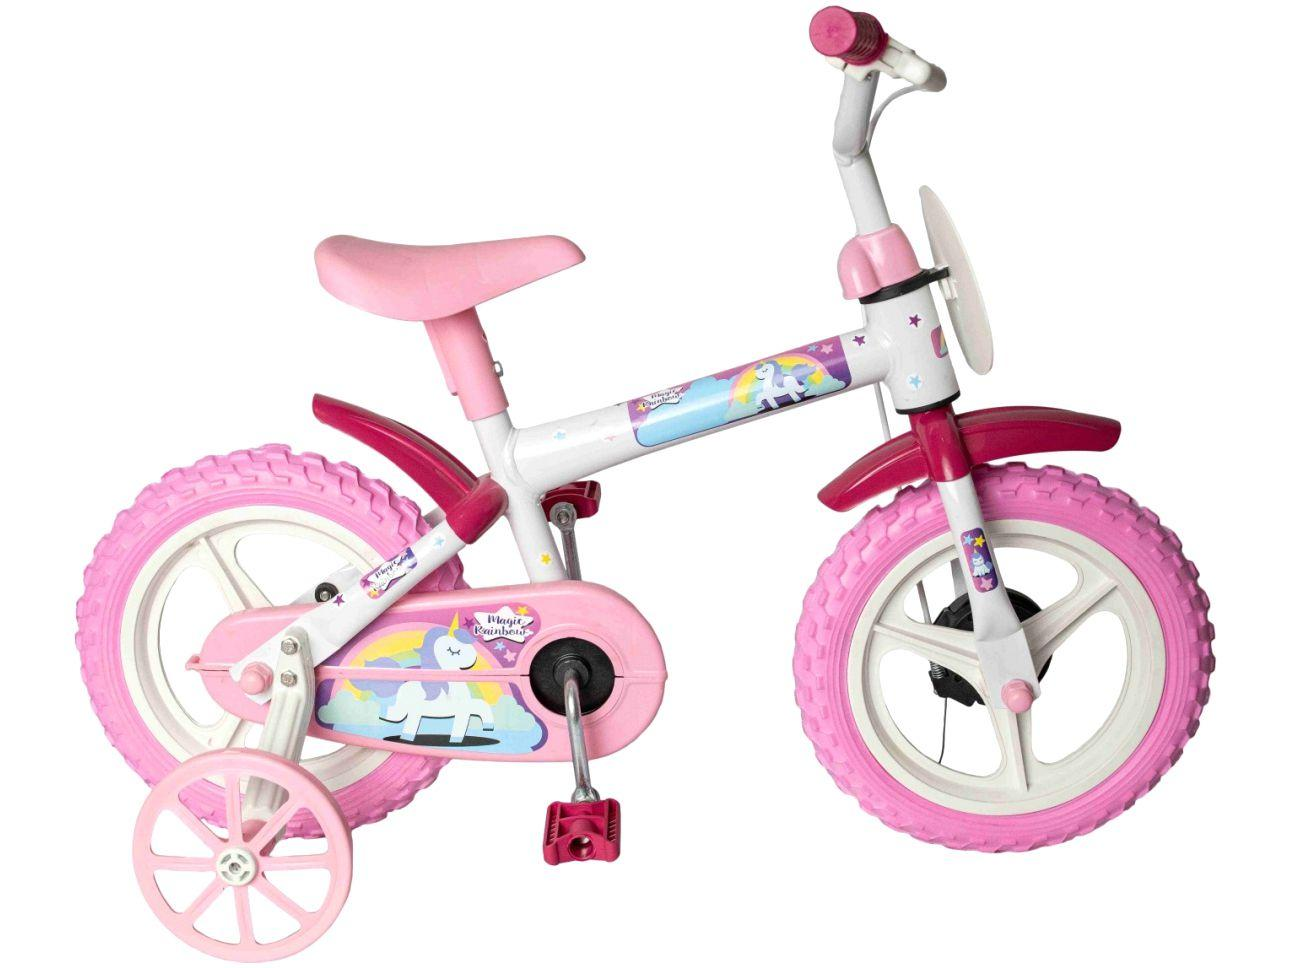 Bicicleta Infantil Aro 12 Styll Kids Magic Rainbow - Rosa e Branco